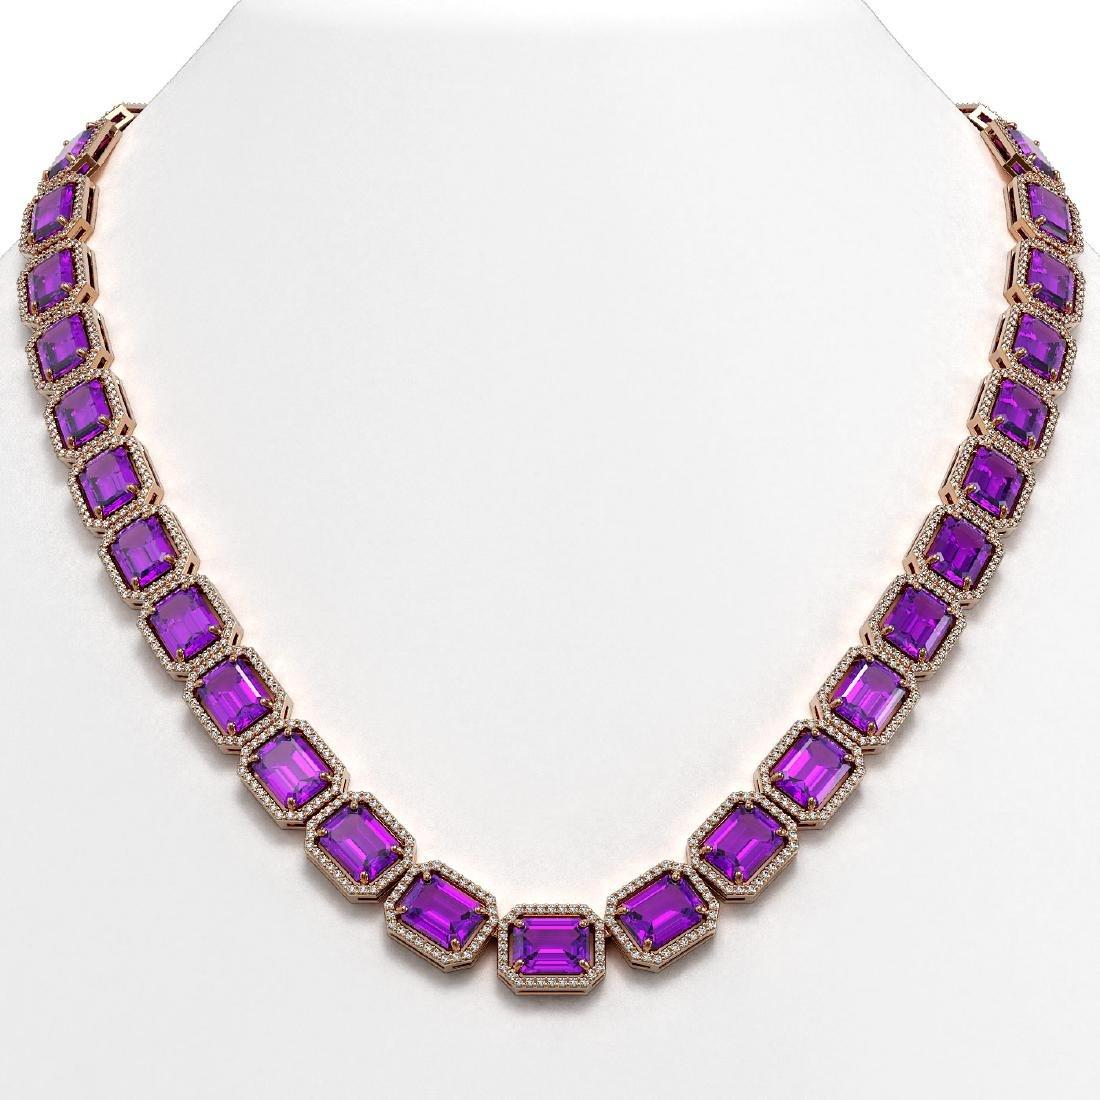 76.69 CTW Amethyst & Diamond Halo Necklace 10K Rose